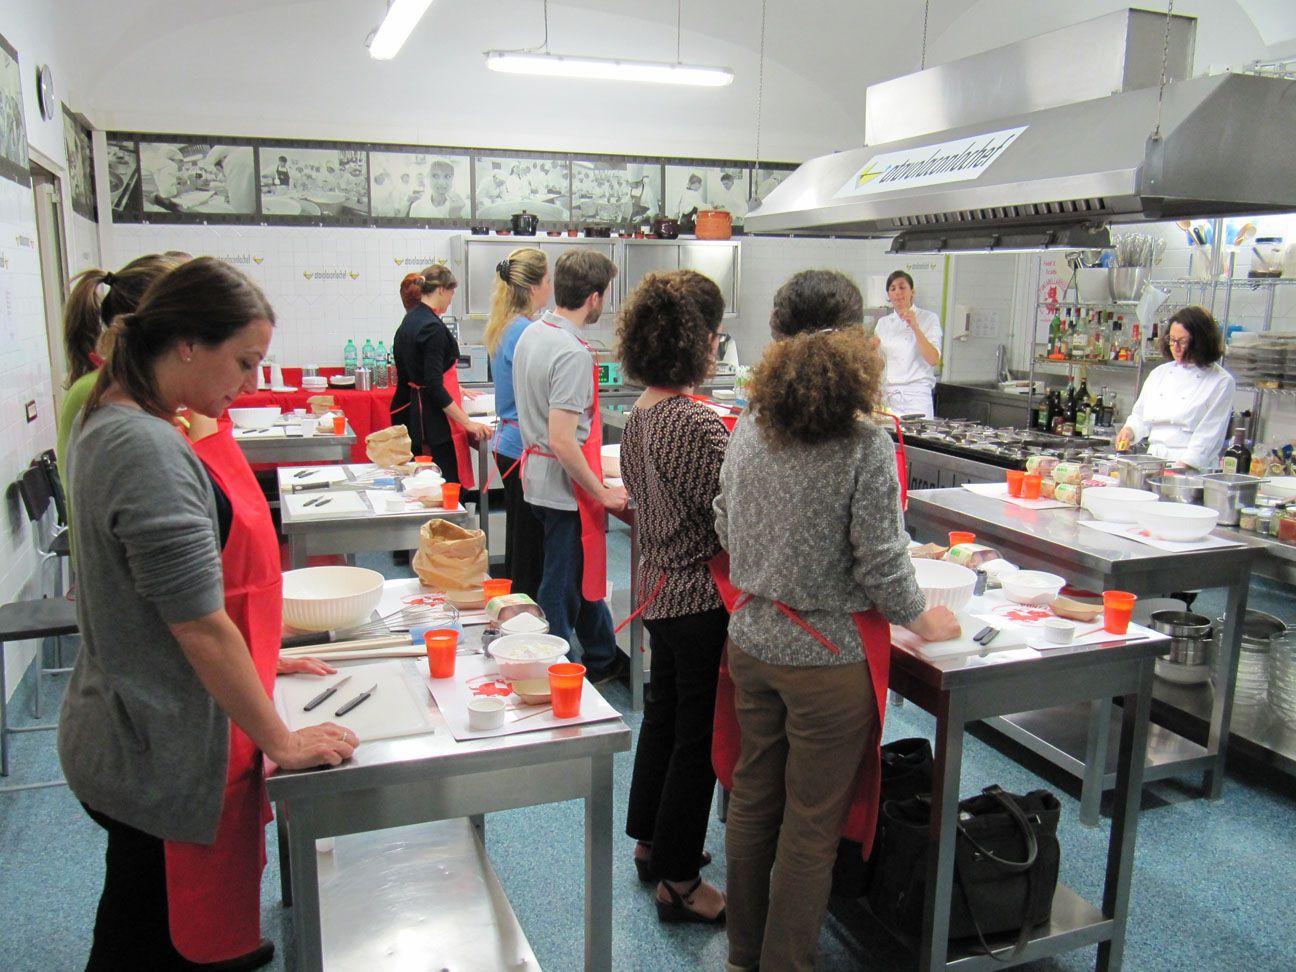 Corsi di cucina a roma puntarella rossa - Corsi di cucina a roma ...